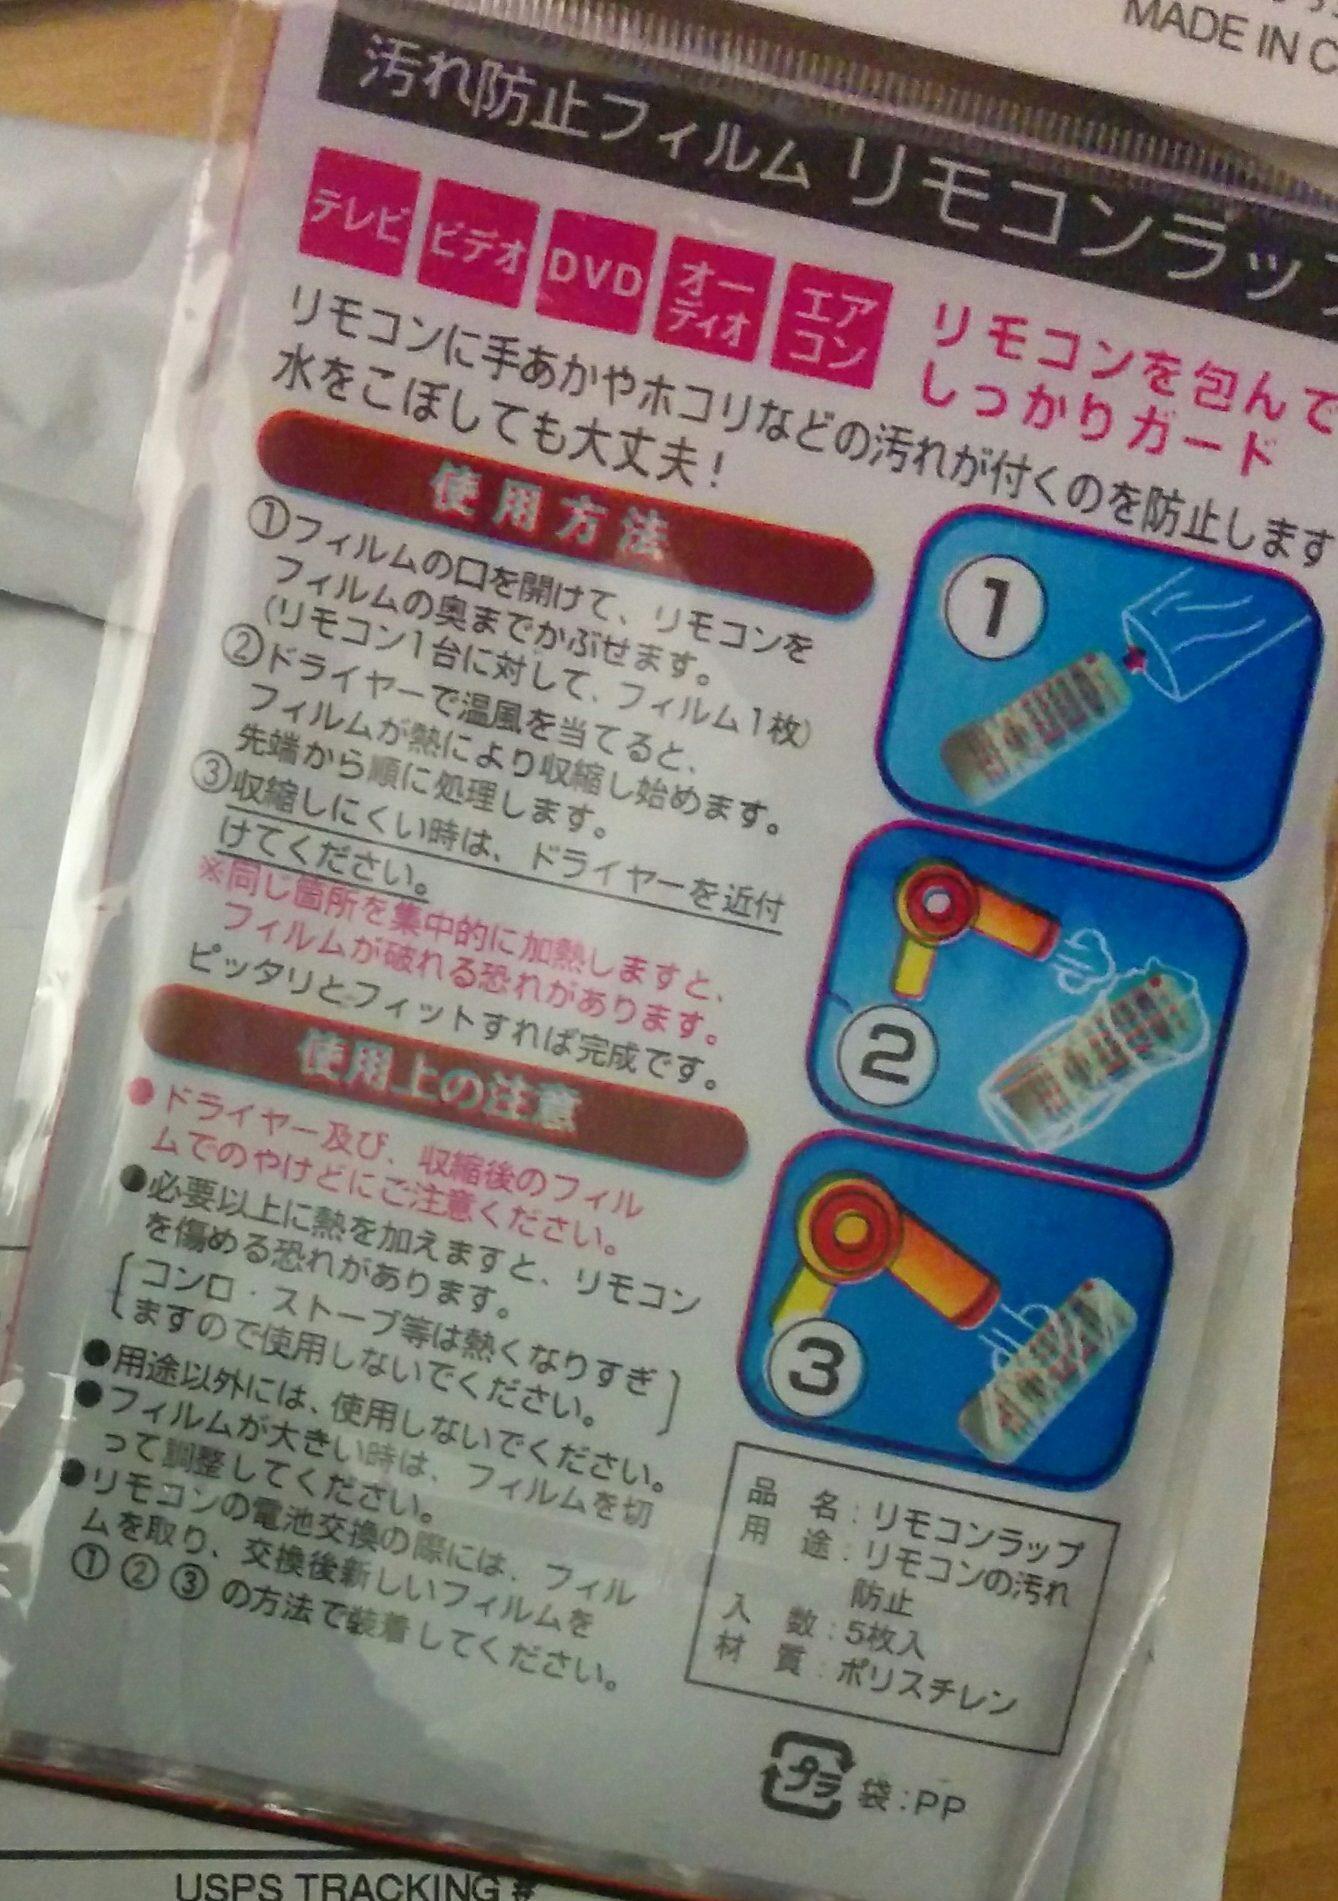 eBay item not as described  – Otaku Patrol Group